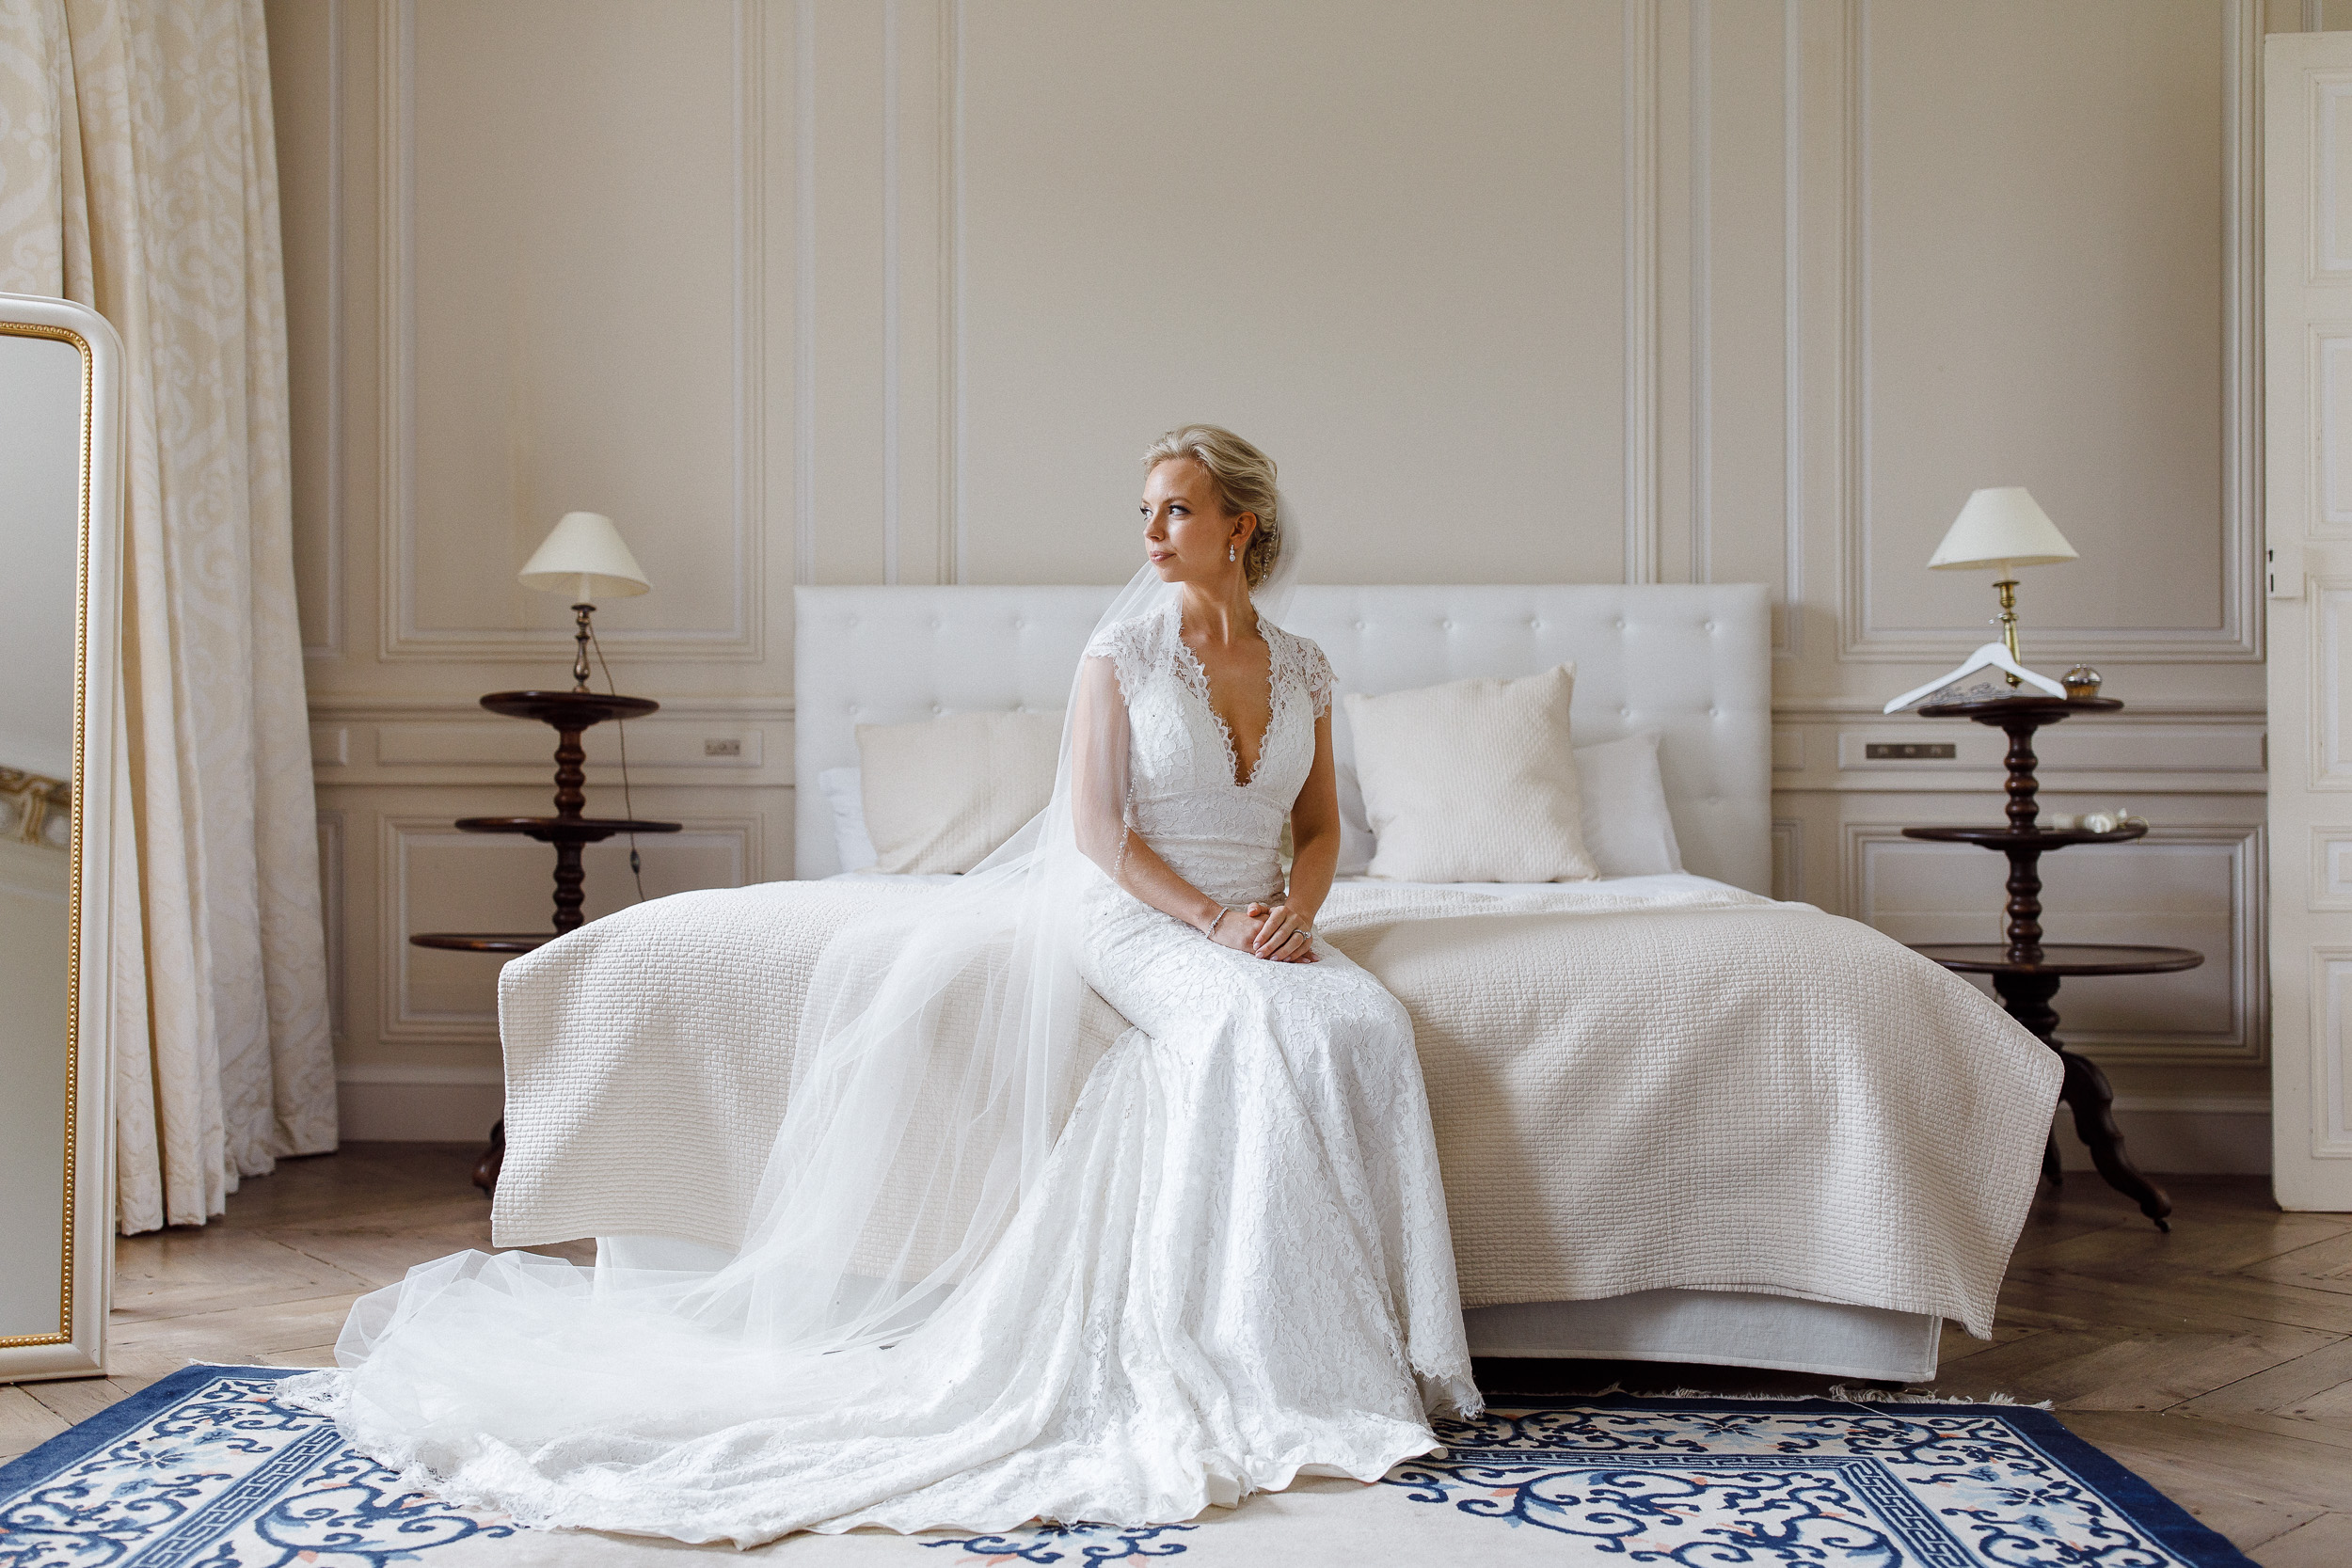 Wedding-Chateau-de-Varennes-037.jpg